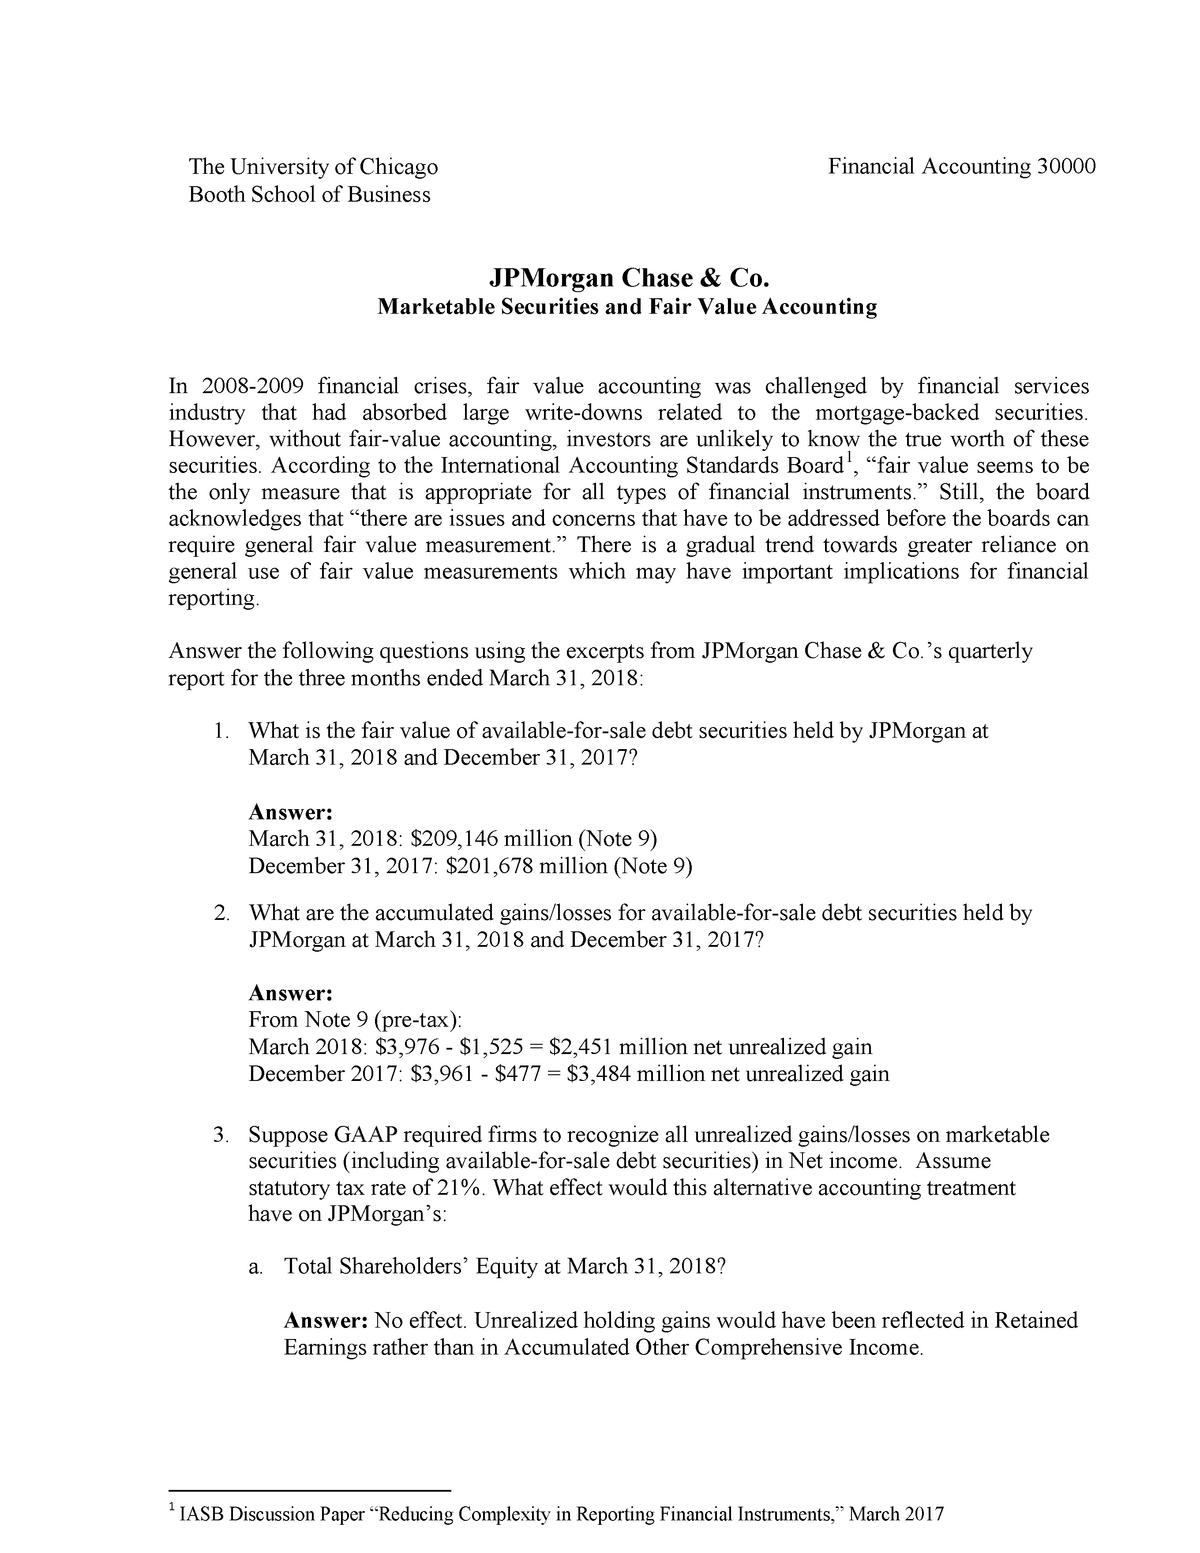 JPMorgan marketable securities solution - BUSN 30000